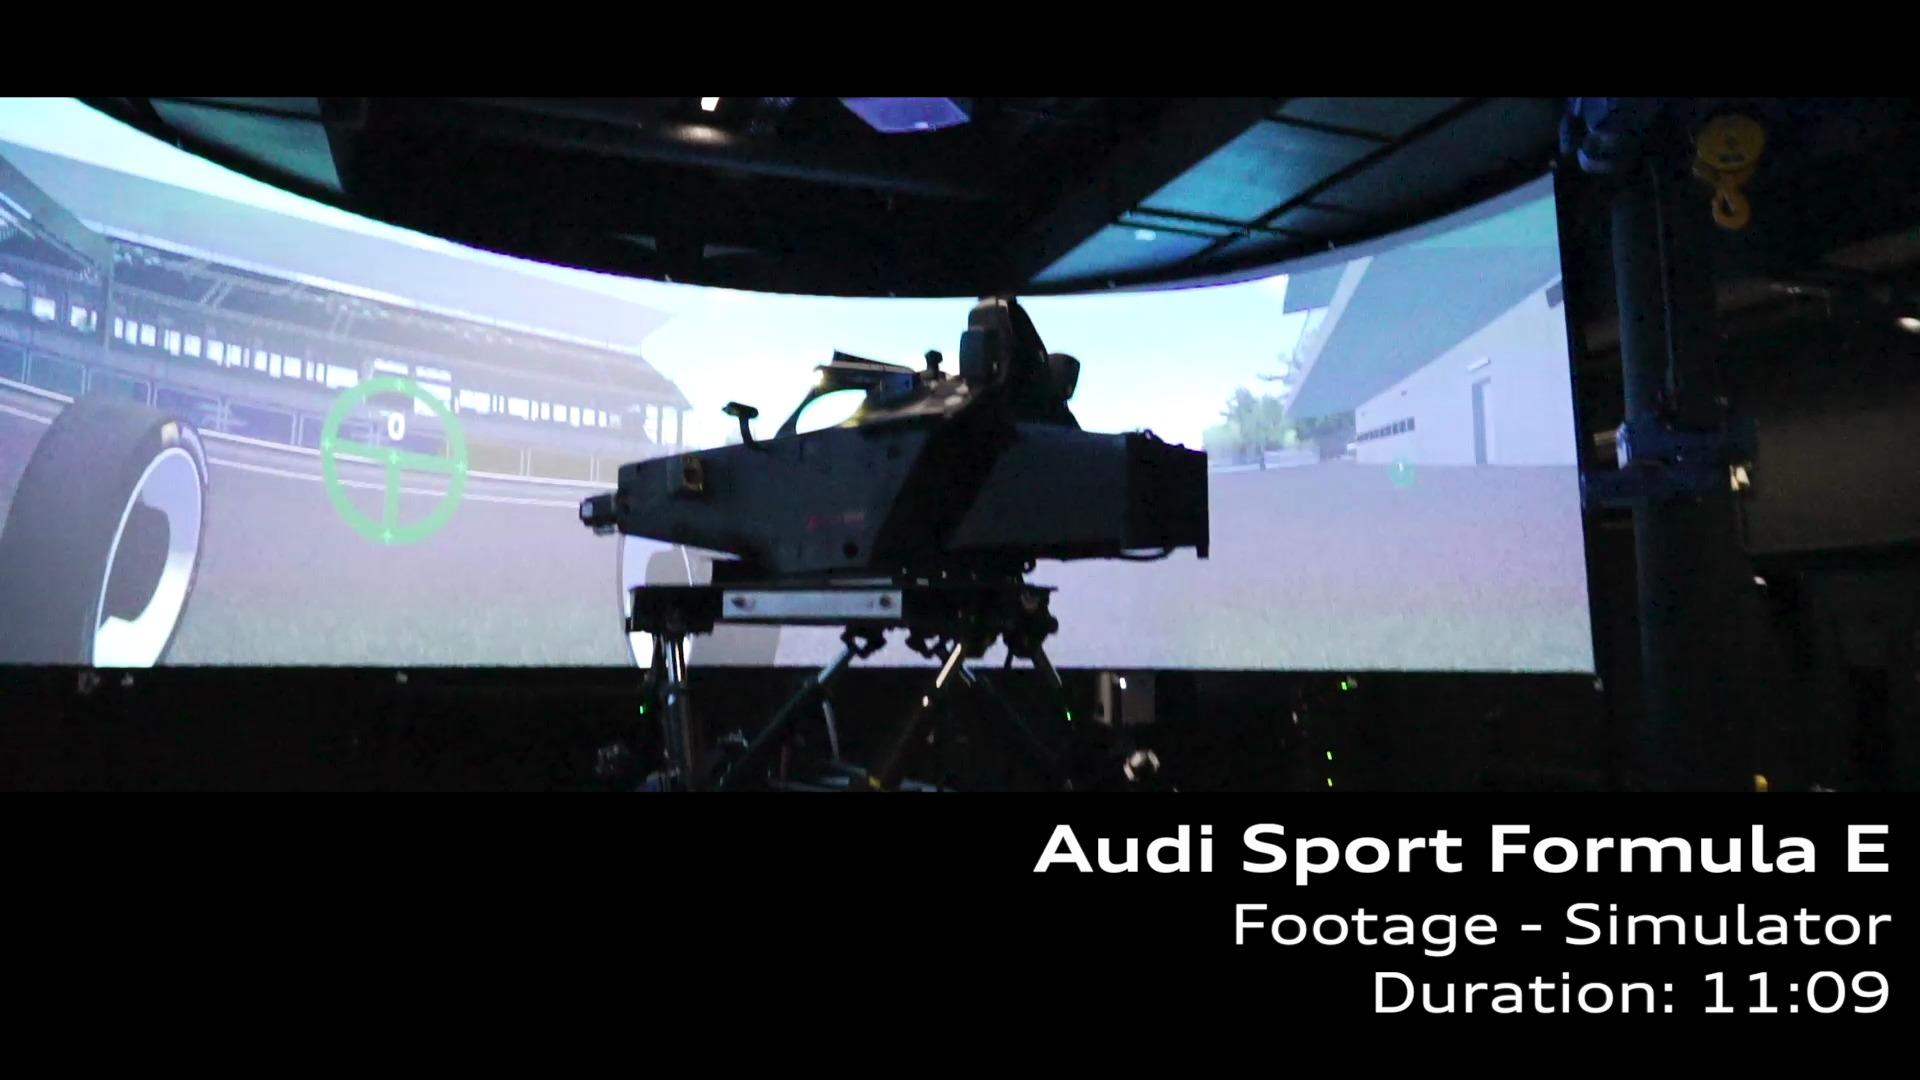 Footage: Audi Sport Formula E Simulator Neuburg